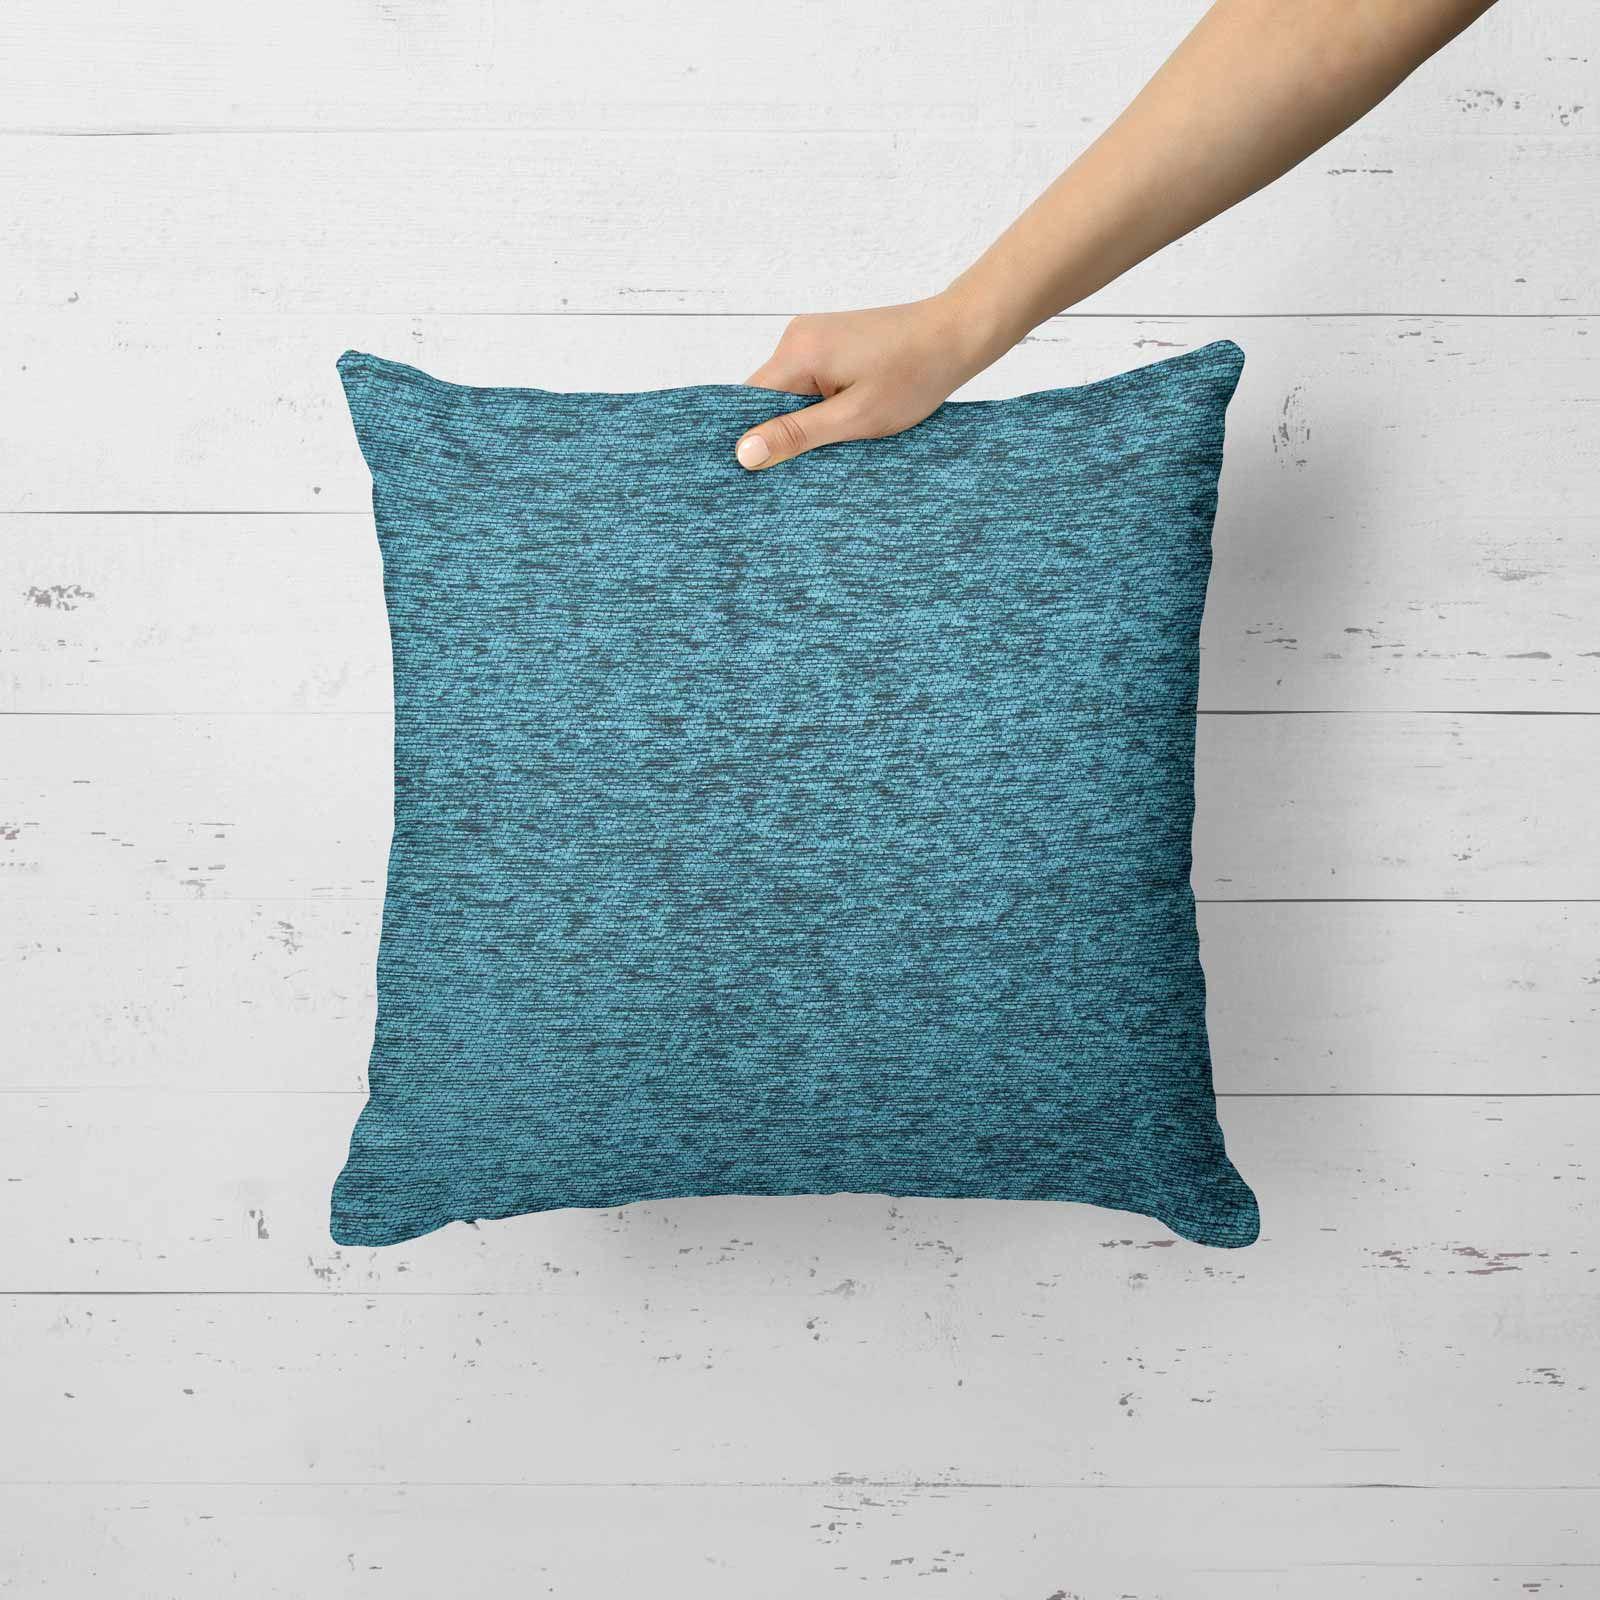 Teal-Blue-Duck-Egg-Cushion-Covers-18-034-x18-034-45cm-x-45cm-Luxury-Cover thumbnail 30